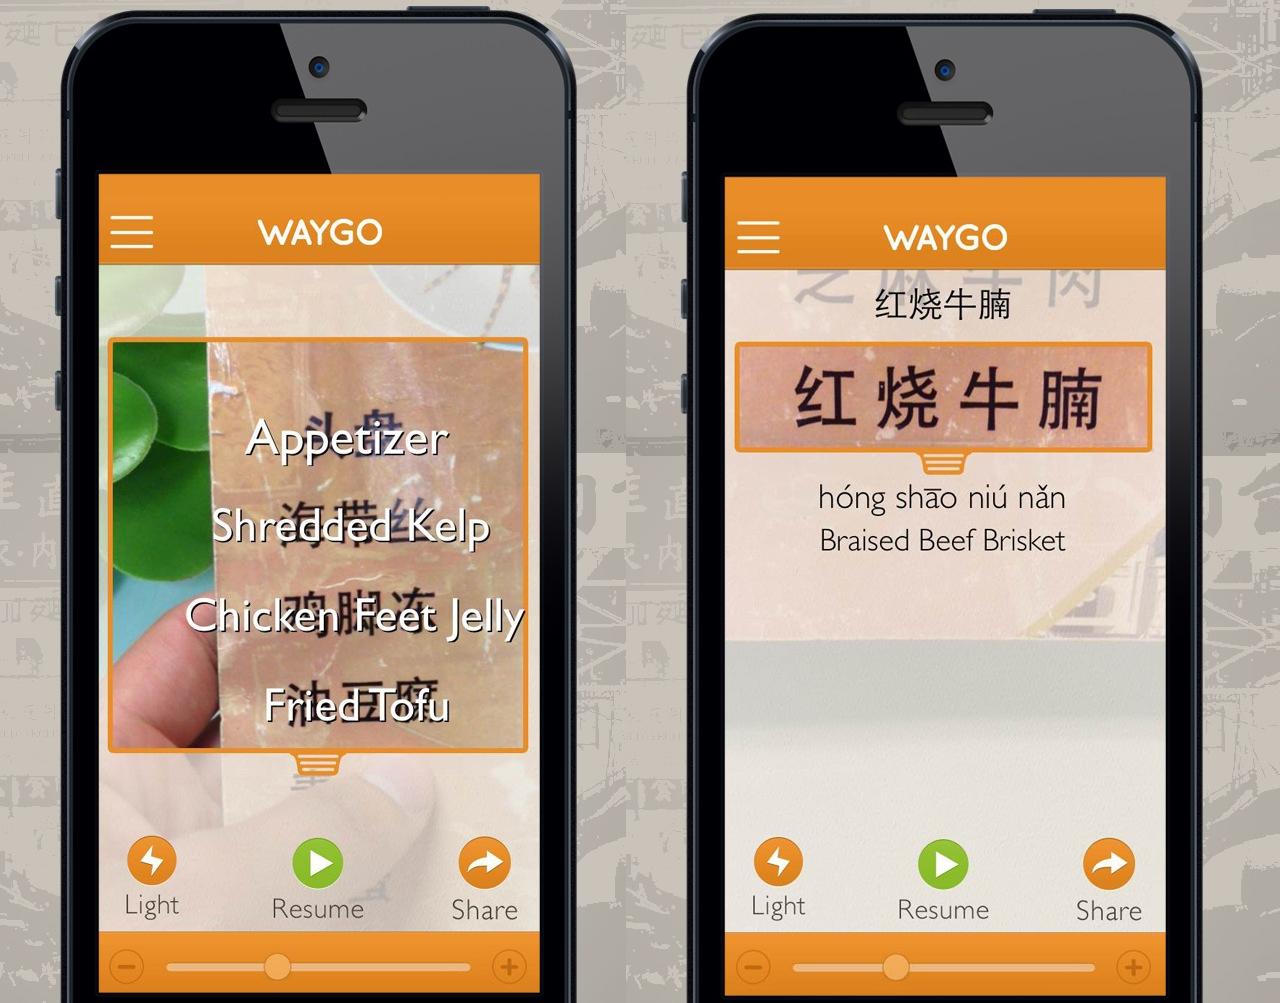 myWebRoom Top Apps Waygo